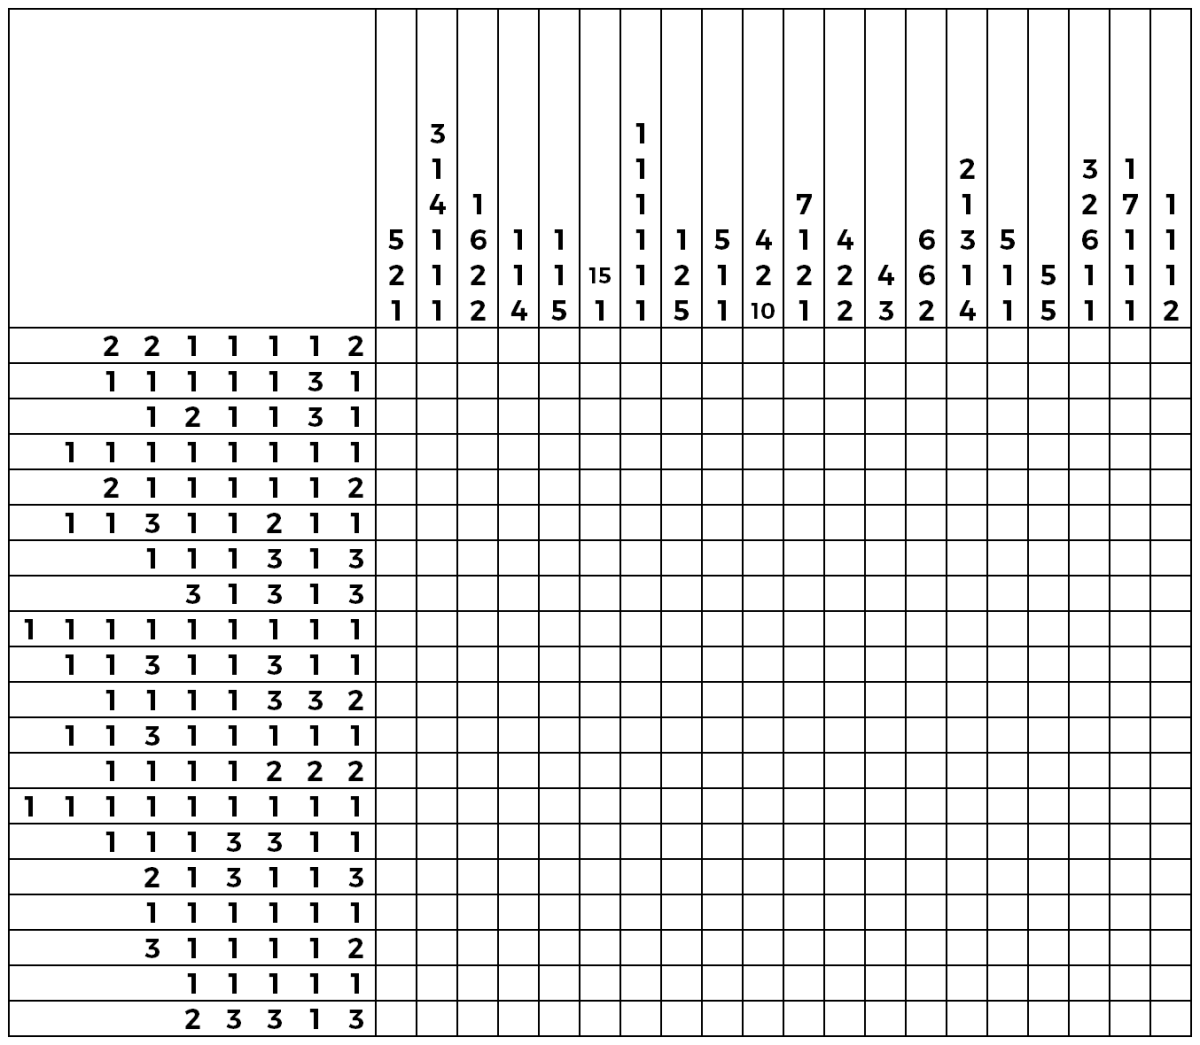 Solving Nonograms with Compressive Sensing: Part1